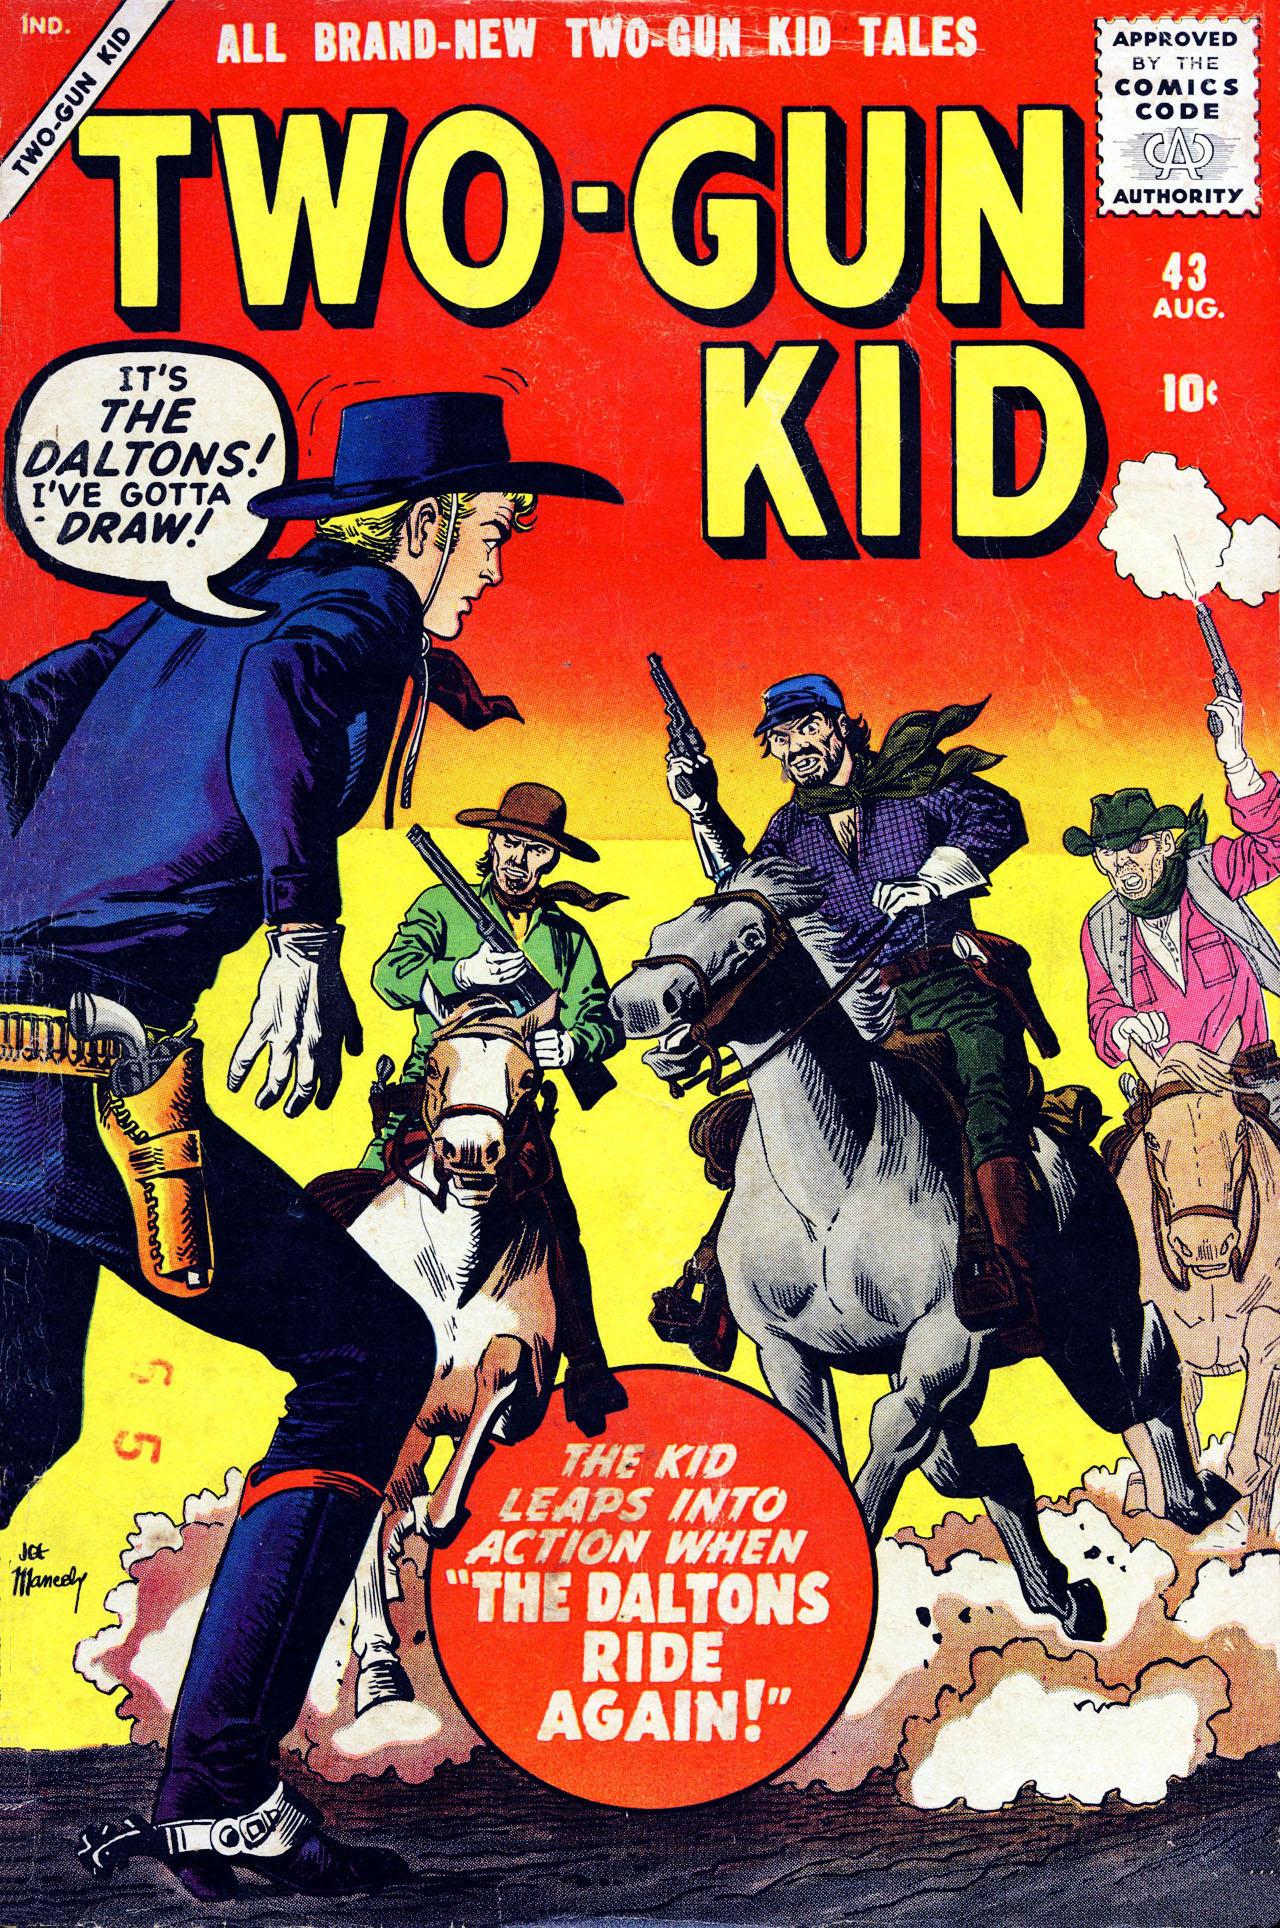 Read online Two-Gun Kid comic -  Issue #43 - 1